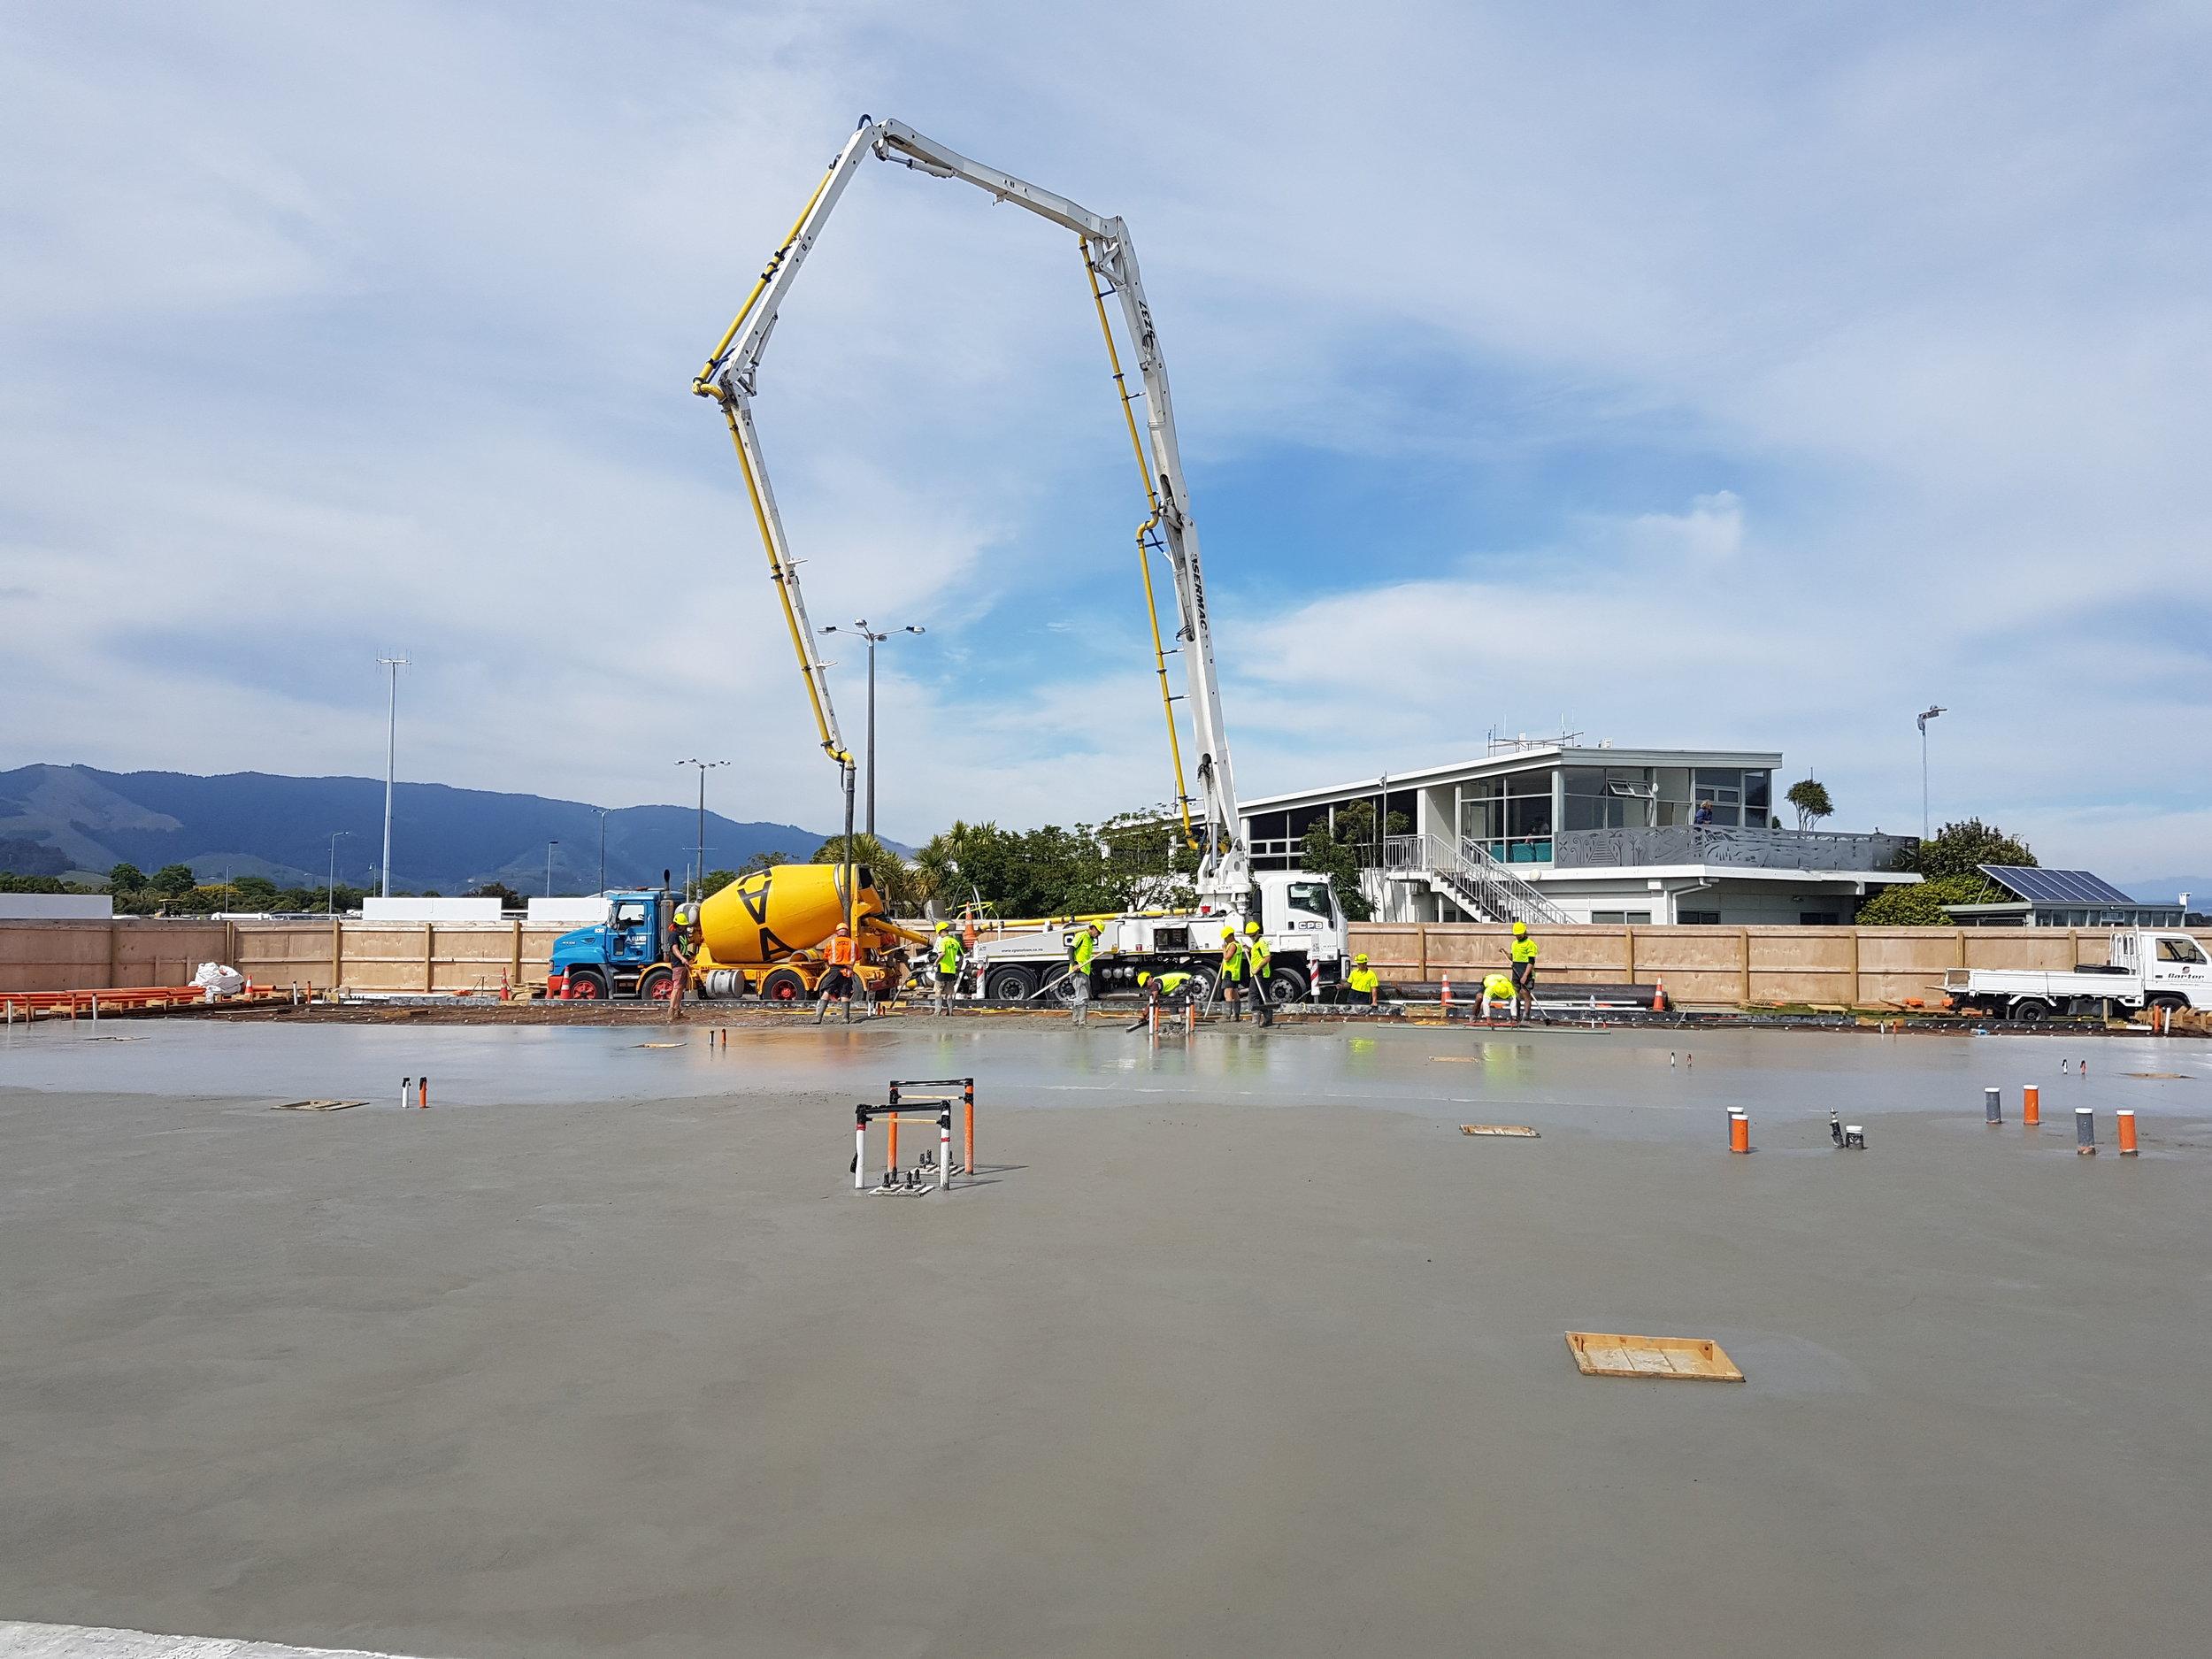 Final concrete pour for Stage A